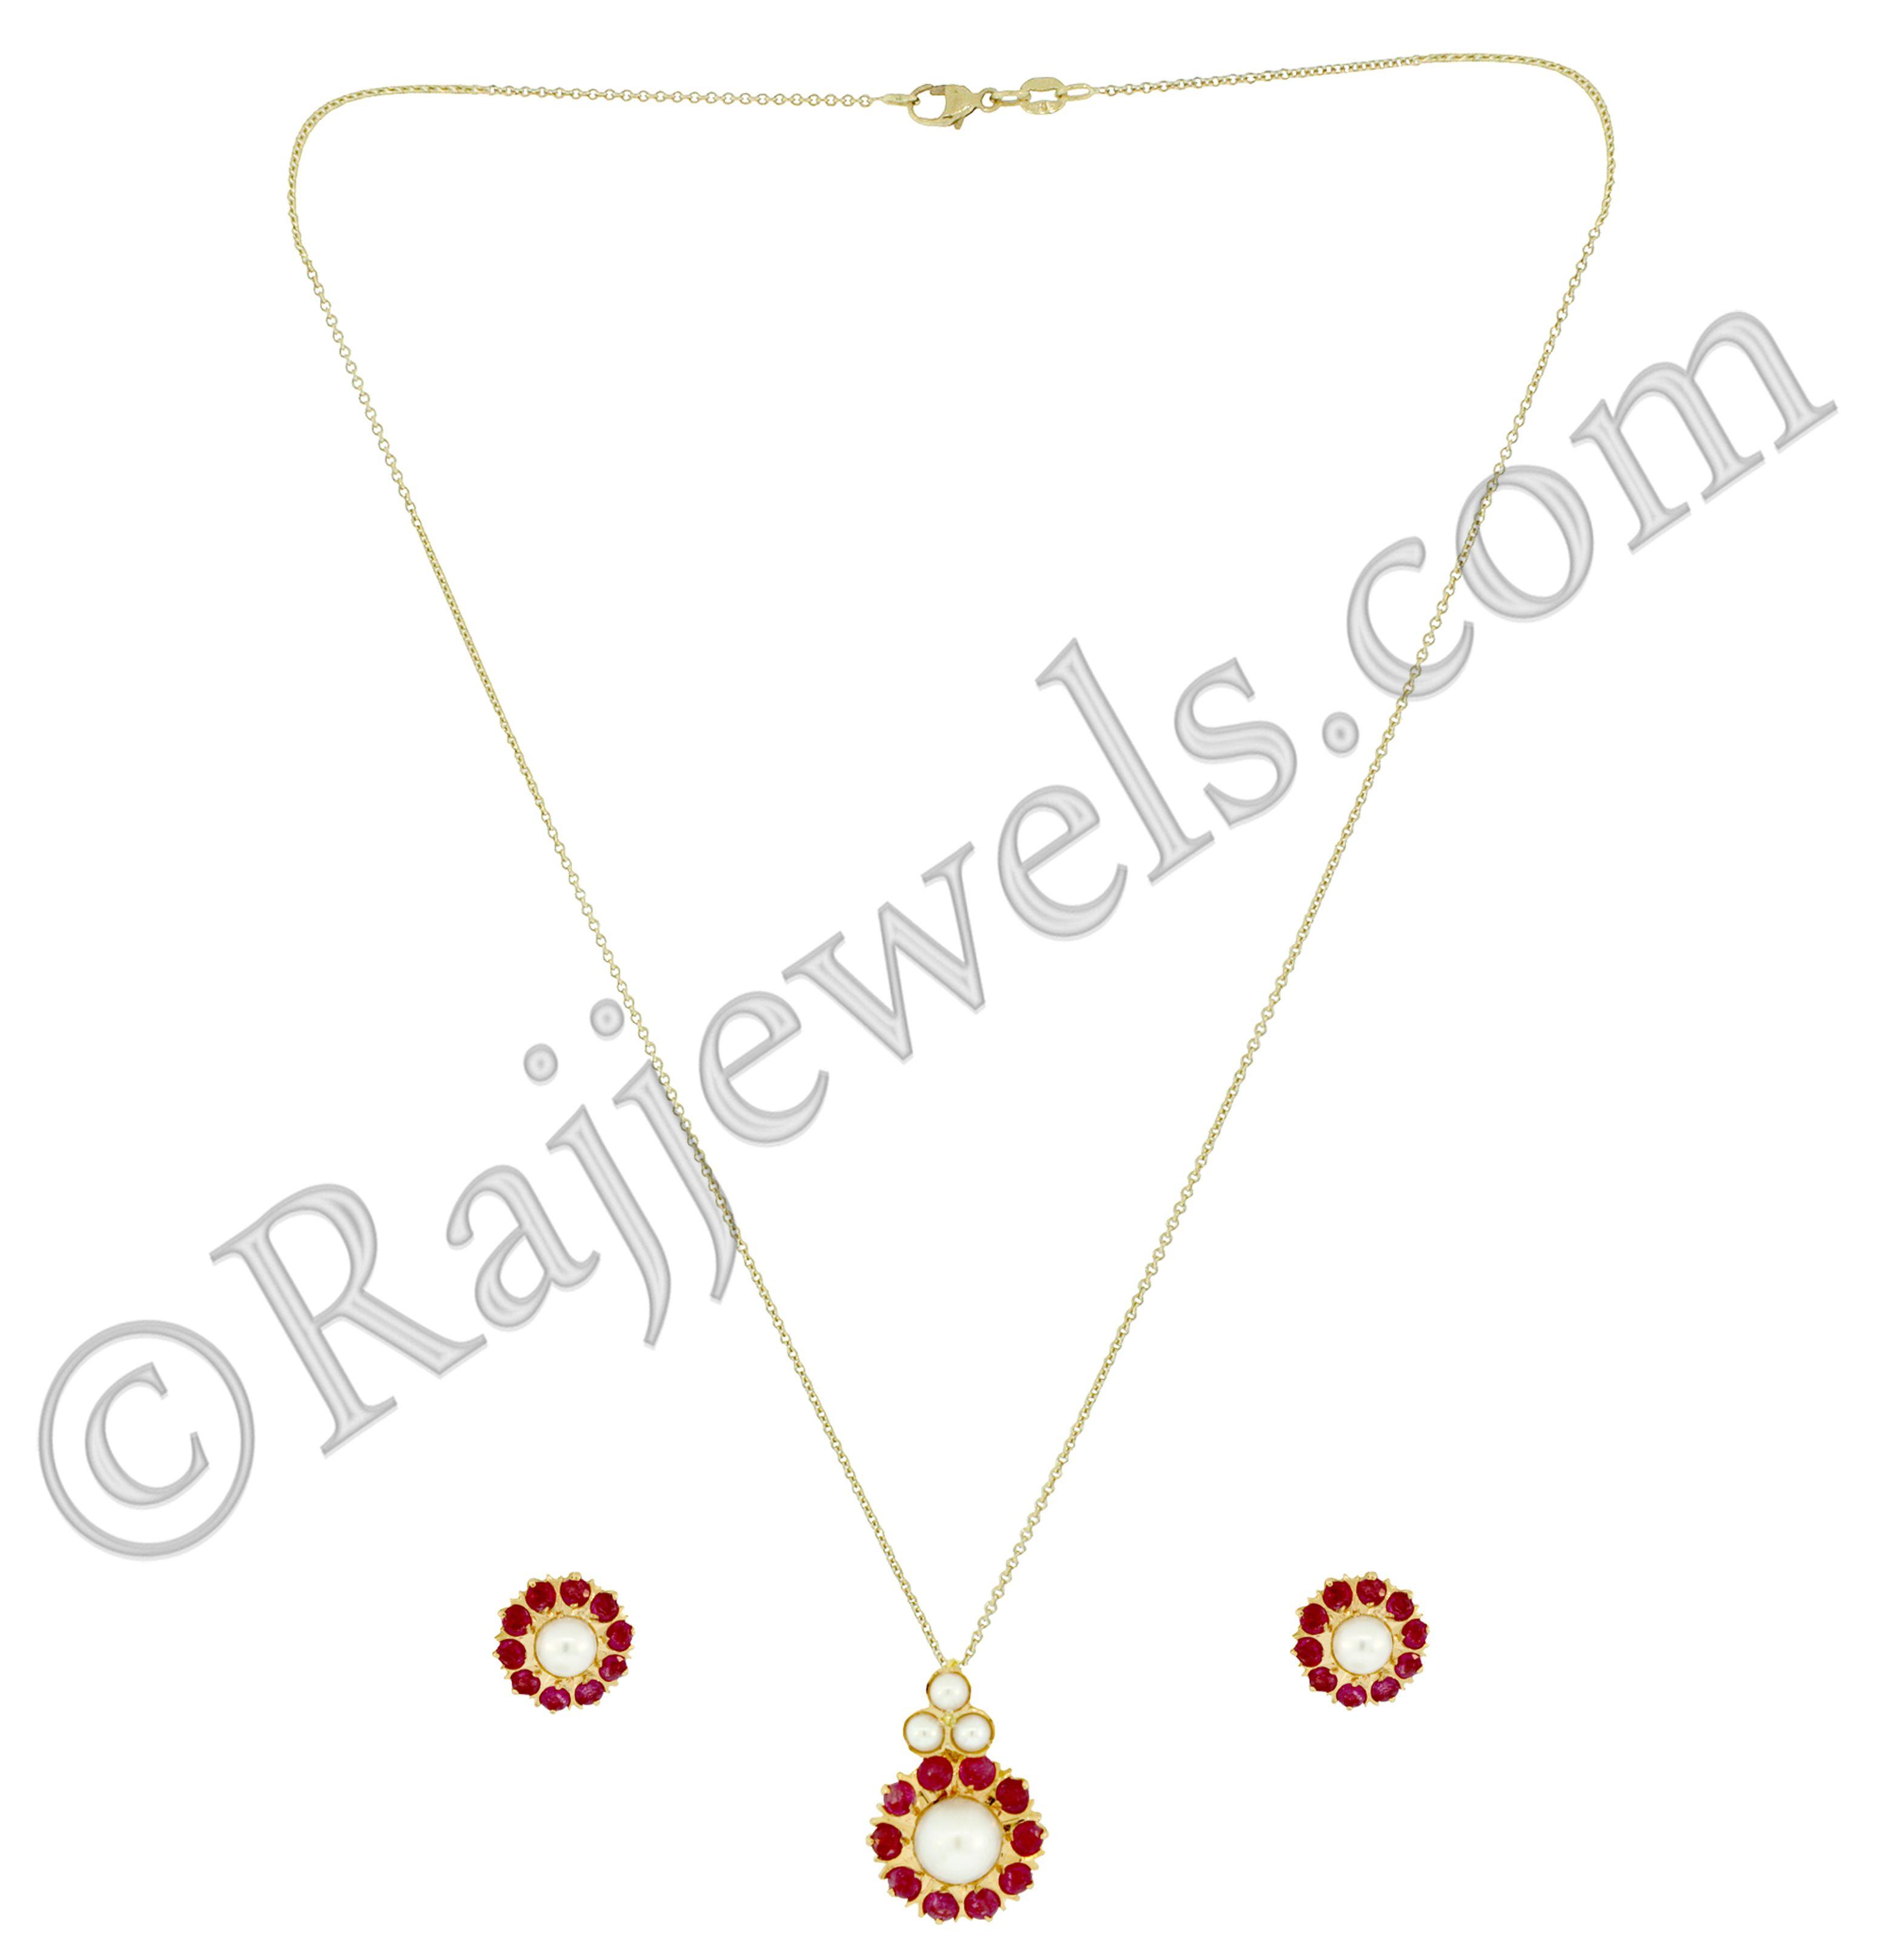 22k Gold Ruby stone pendant necklace